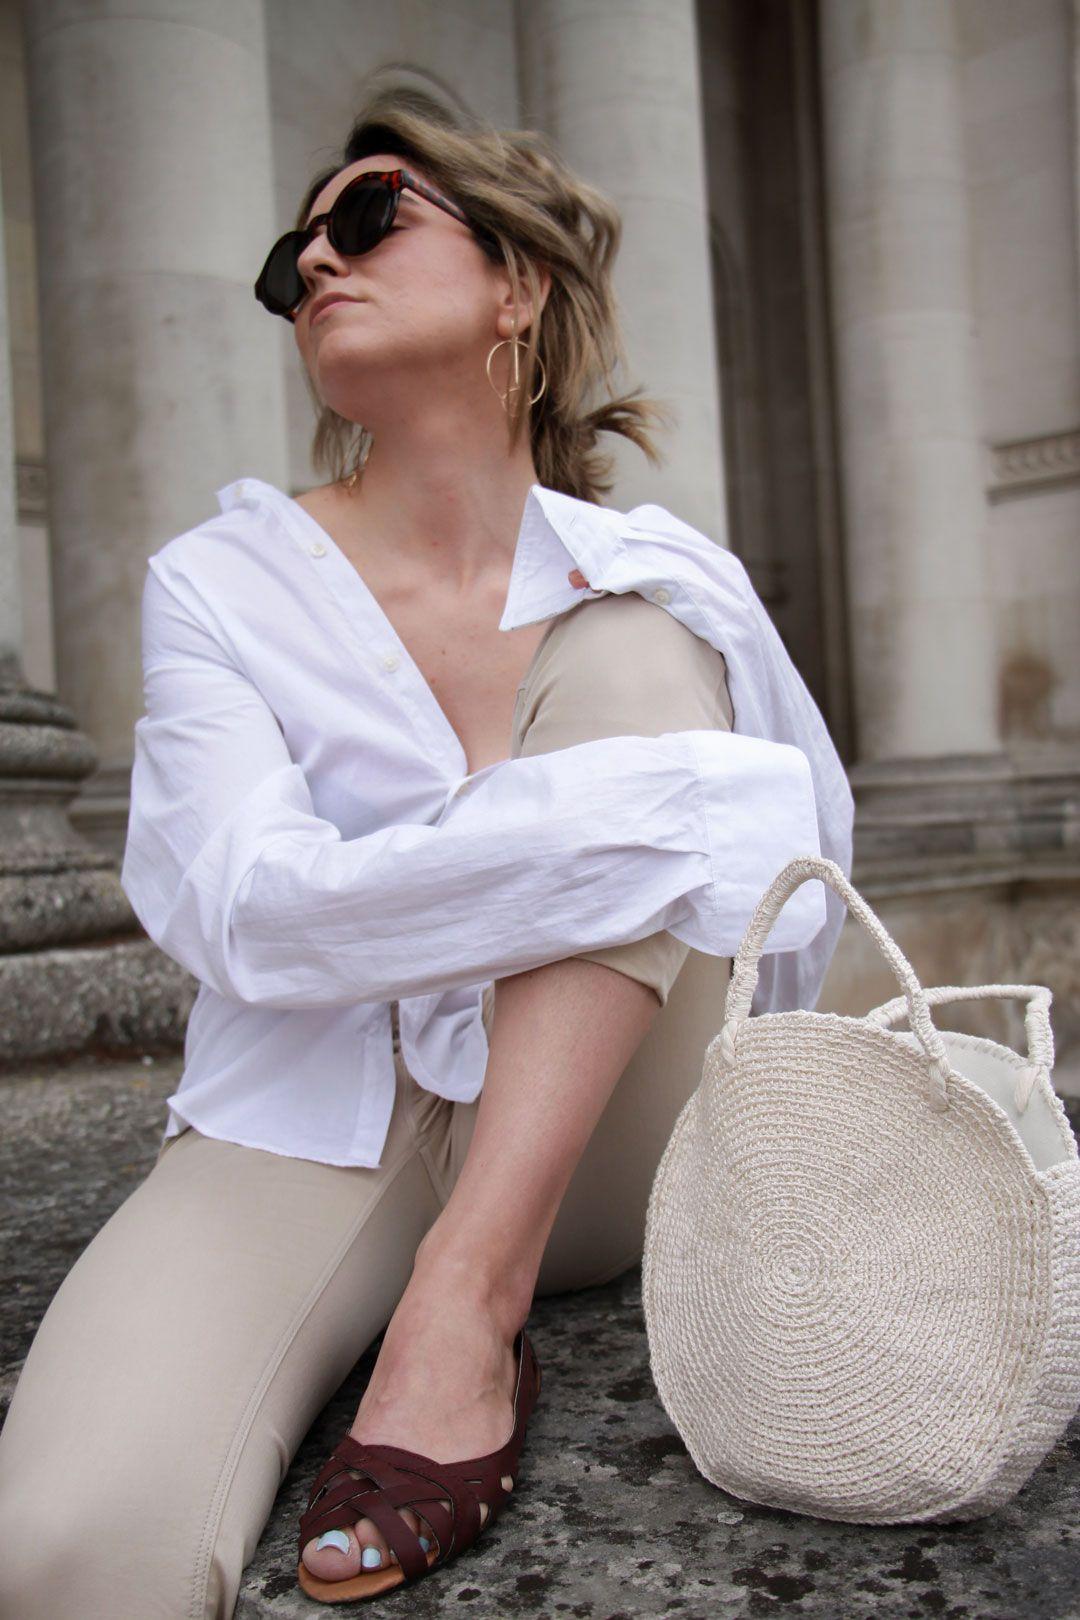 An ode to Fashion   Fashion at the Museum: The edit   #Minimalchic   #boyfriendshirt   #Fashioneditorial   Fitzwilliam Museum   #Retro   #whiteshirtandbelt   #Roundbag   #Roundcrochetbag   She talks Glam   Saida Antolin   UK blogger   #Summeroutfit   #OutfitInspiration   #Effortlesschic   #Parisianstyle   #Attitude   How to style a white shirt   Off the shoulder shirt   #structuredbag   #Simplelook   #minimalstreetstyle   Waist belt for a retro look